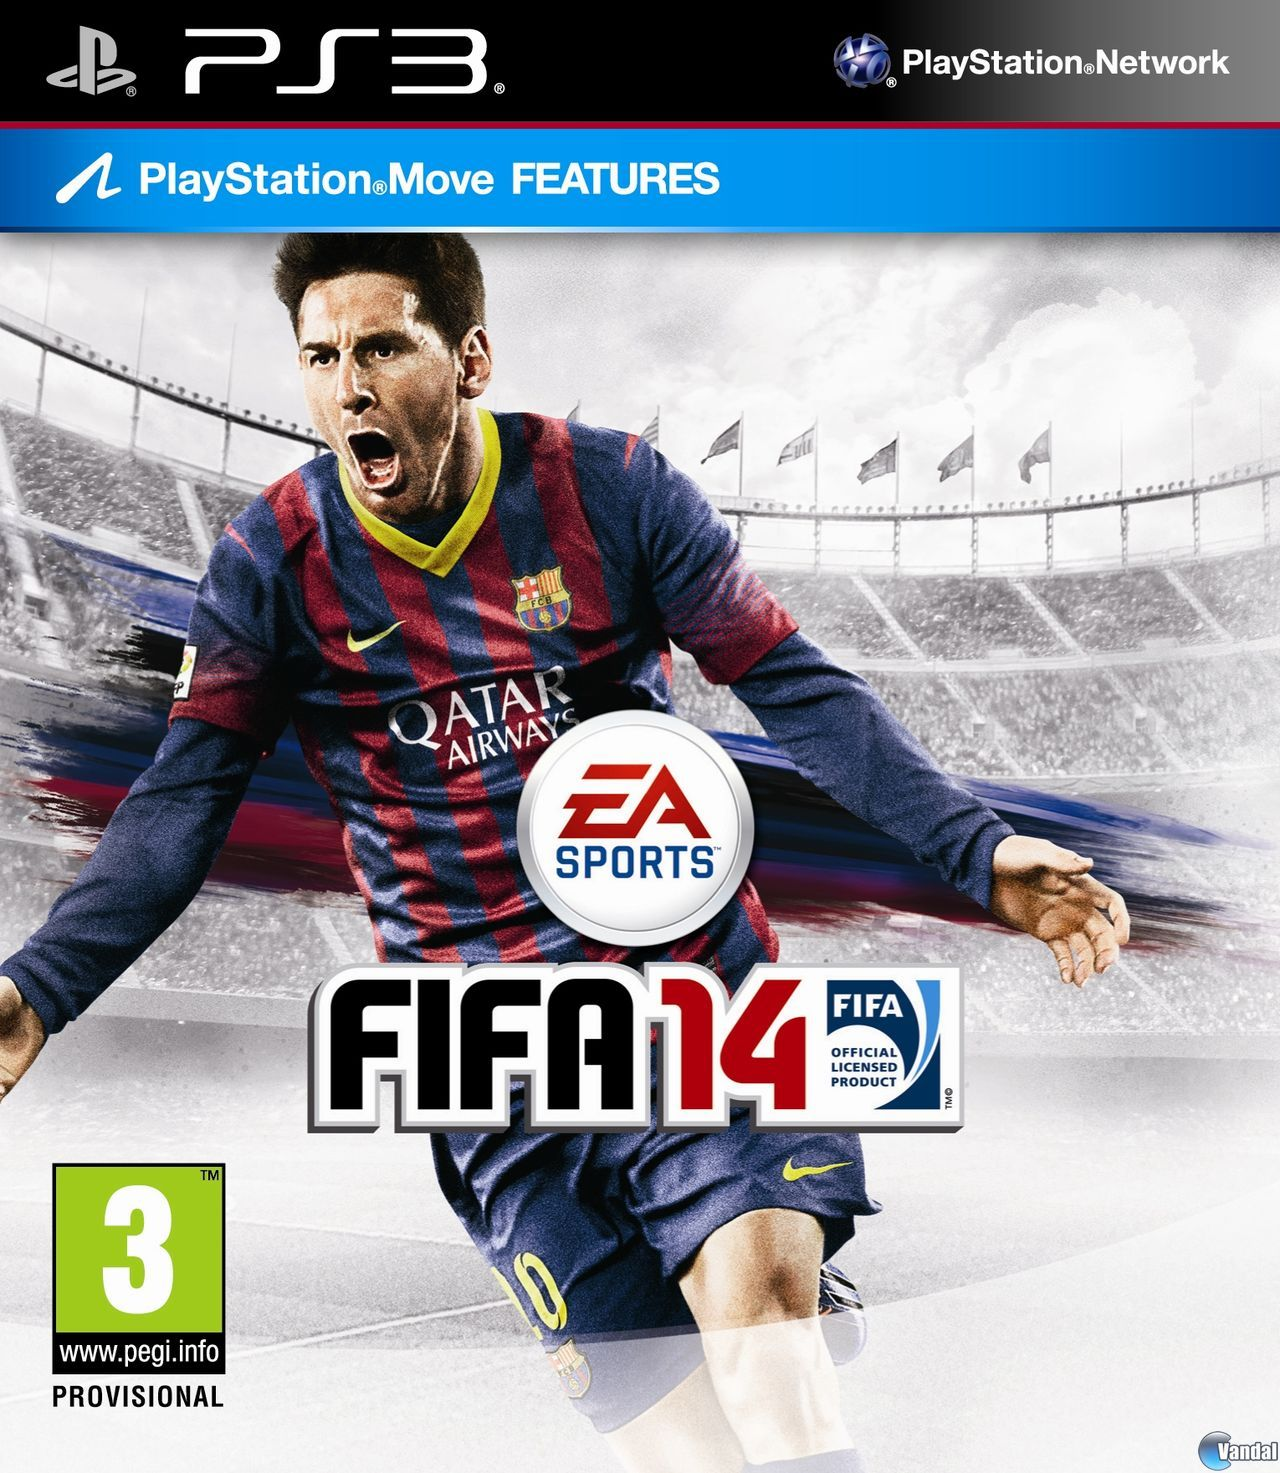 Download image Fifa 14 Ps3 Lanzamiento 26 9 2013 Xbox360 PC, Android ...